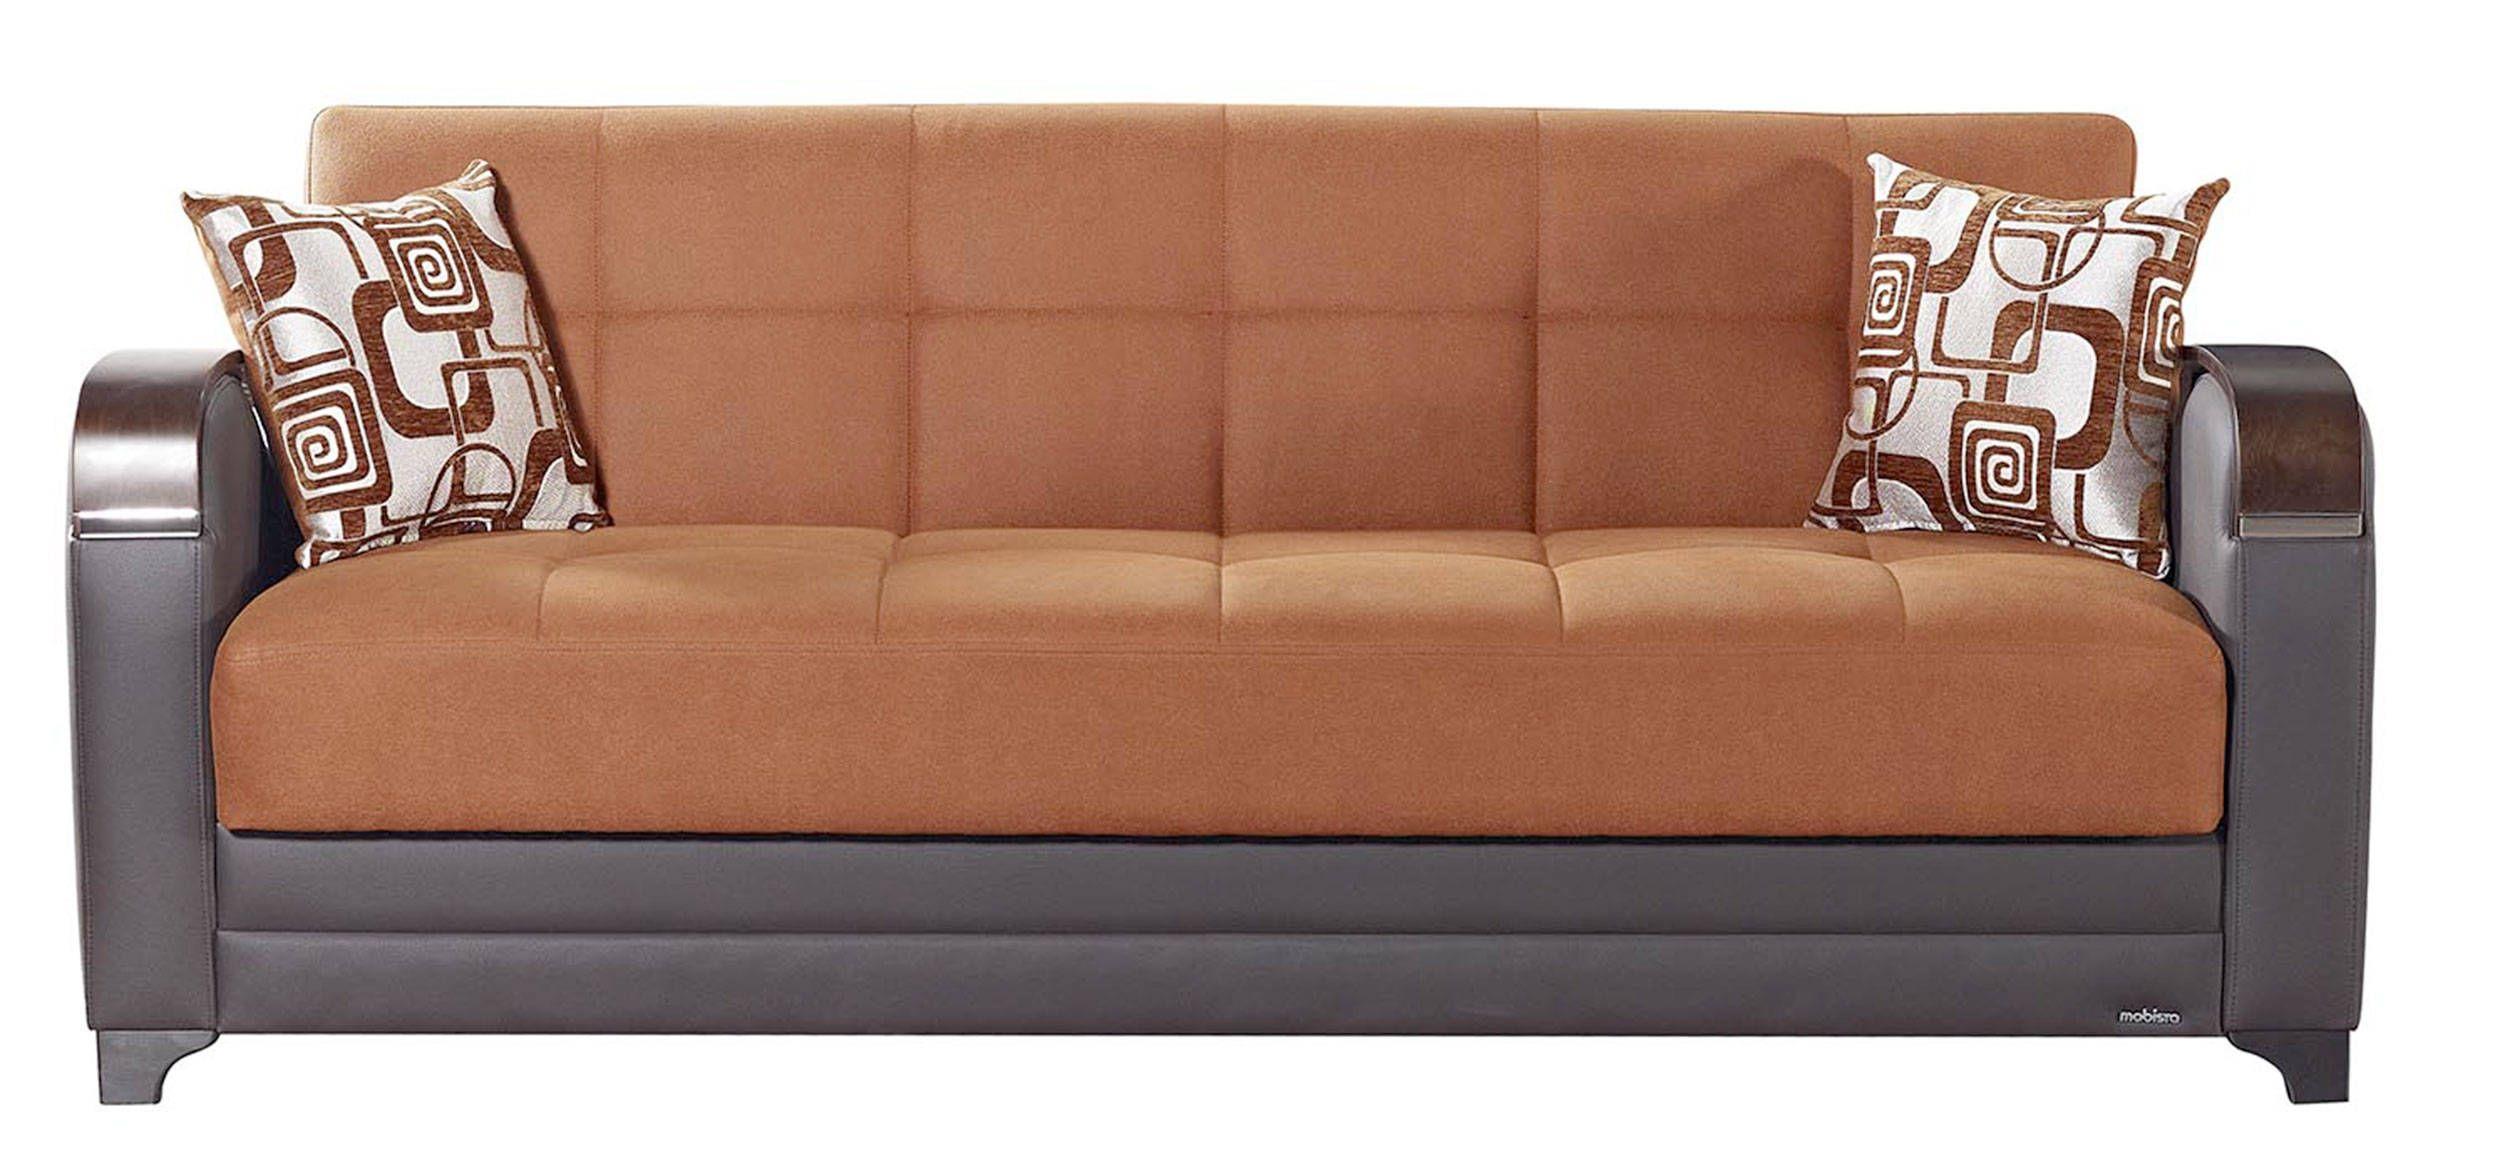 Etro Vintage Terra Cotta Fabric PU MDF Plywood Storage Sofa Bed